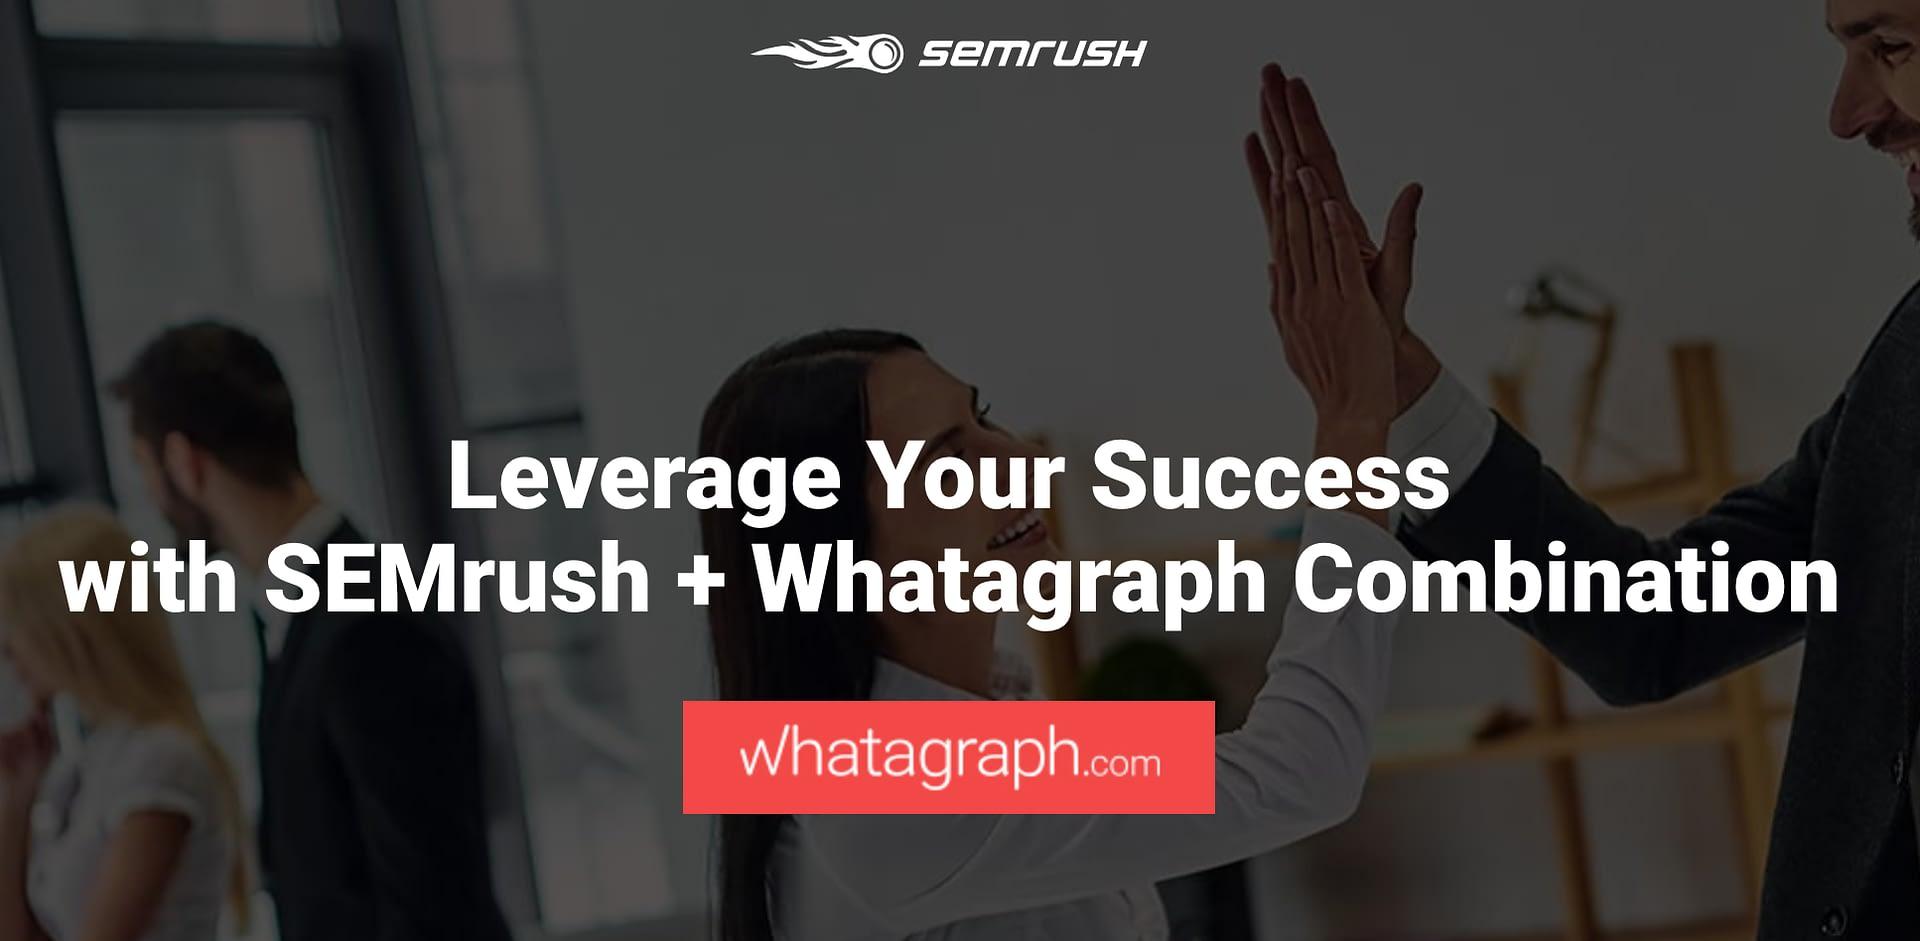 SEMrush + Whatagraph